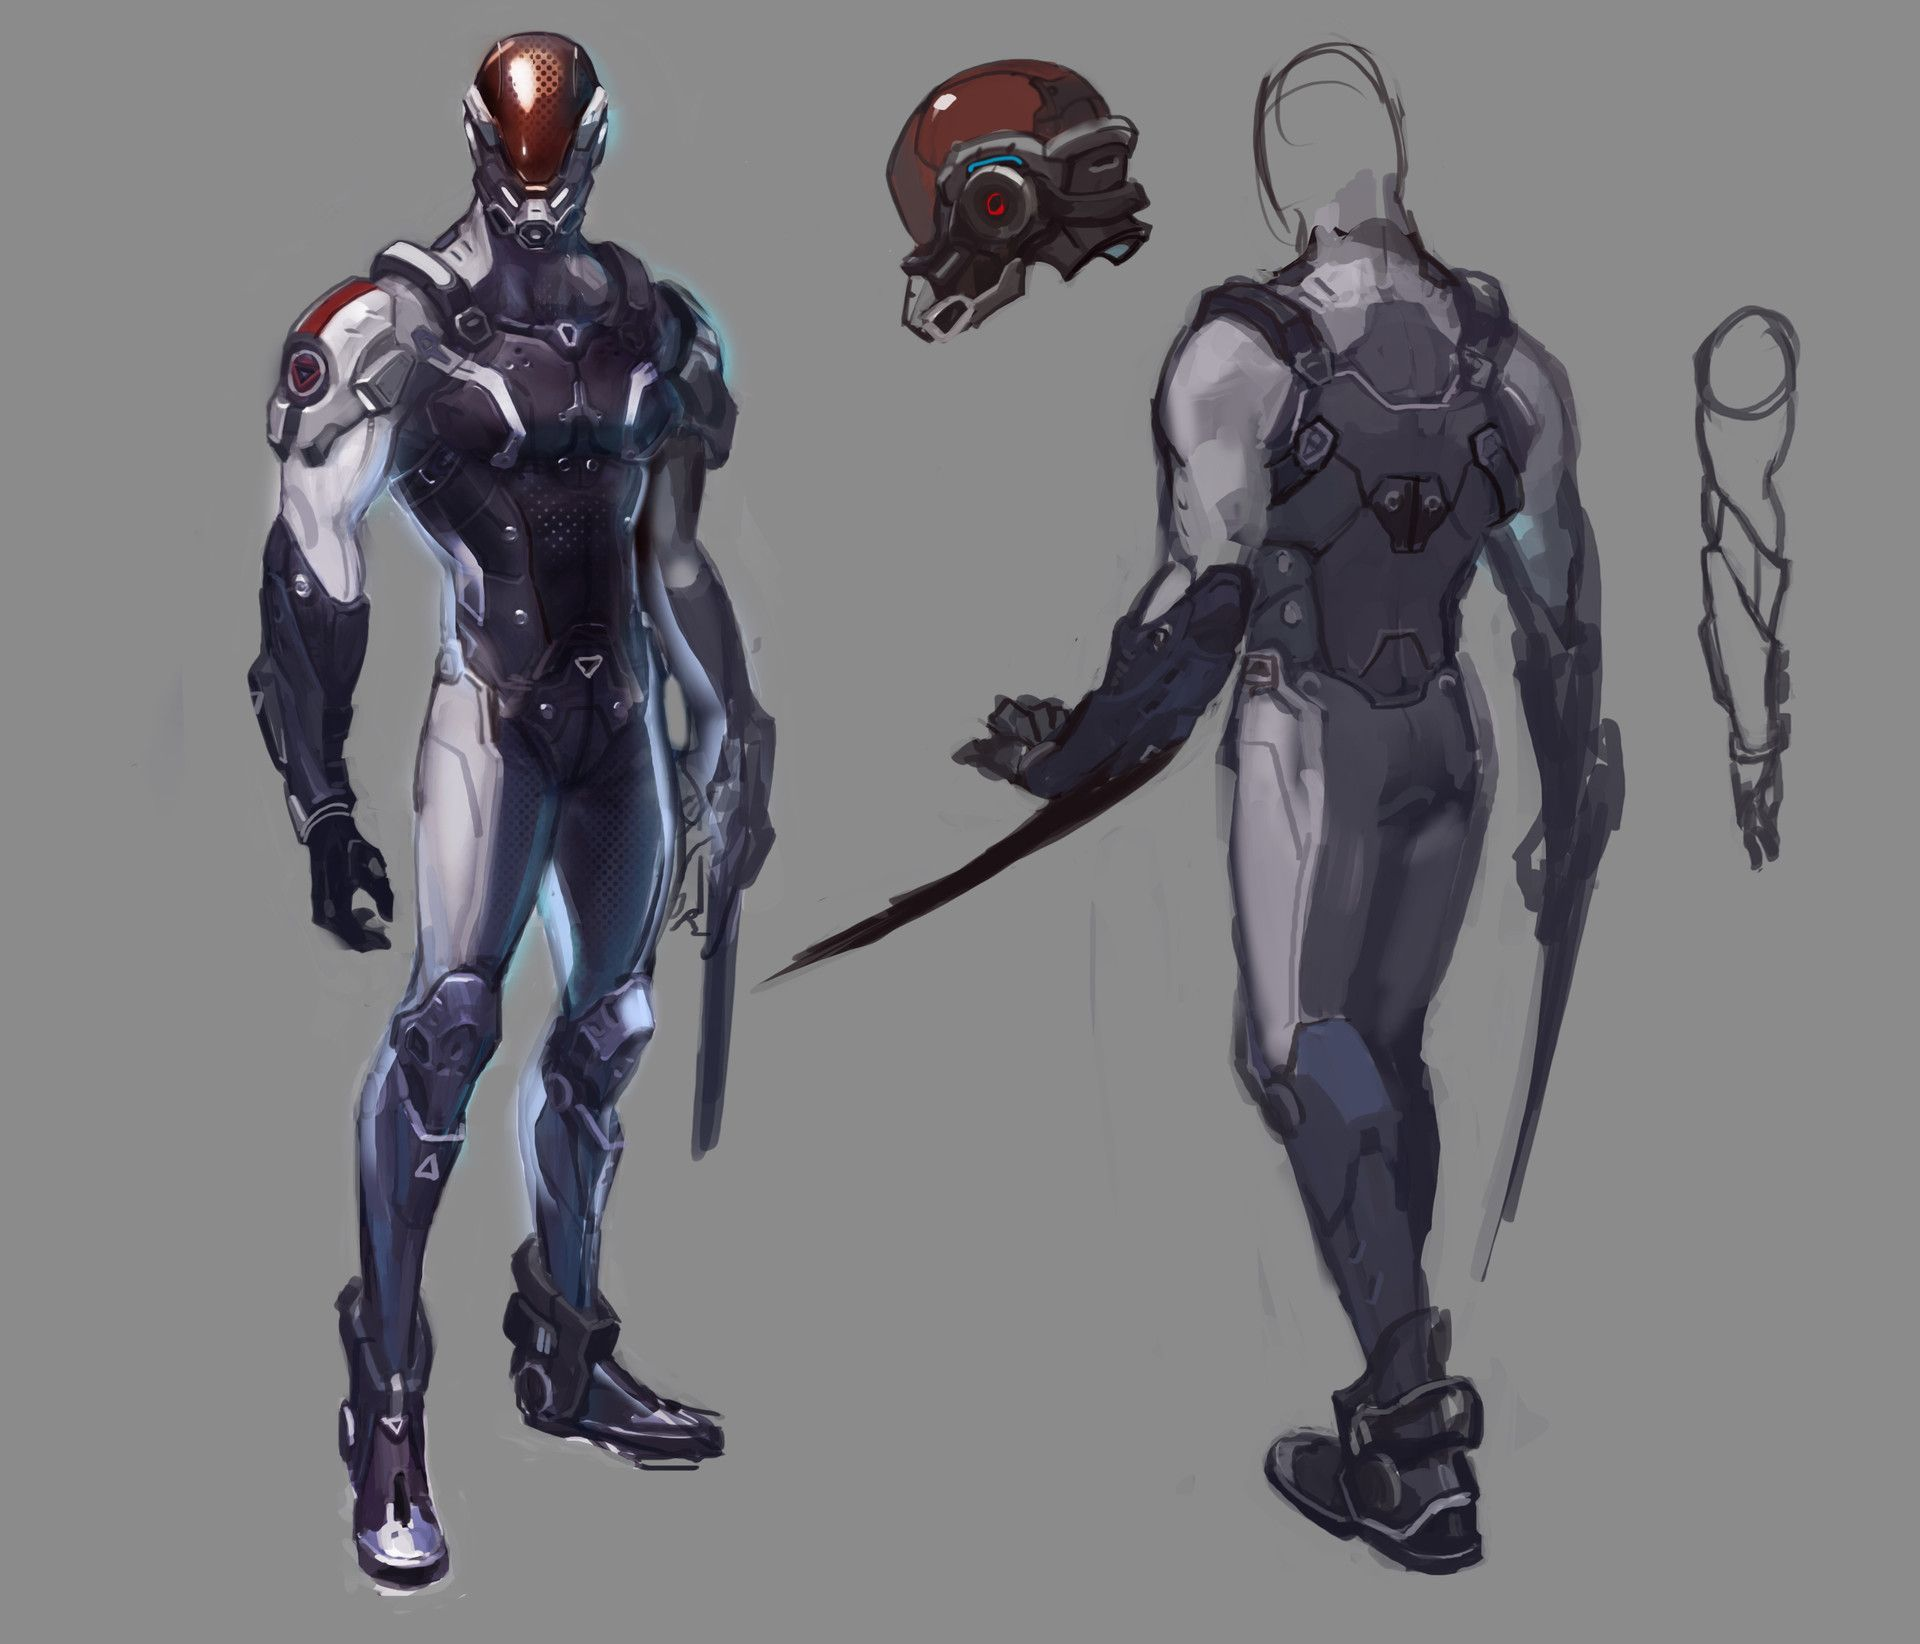 Artstation Old Project Pc Concept Art Rd Lys With Images Weapon Concept Art Sci Fi Concept Art Concept Art